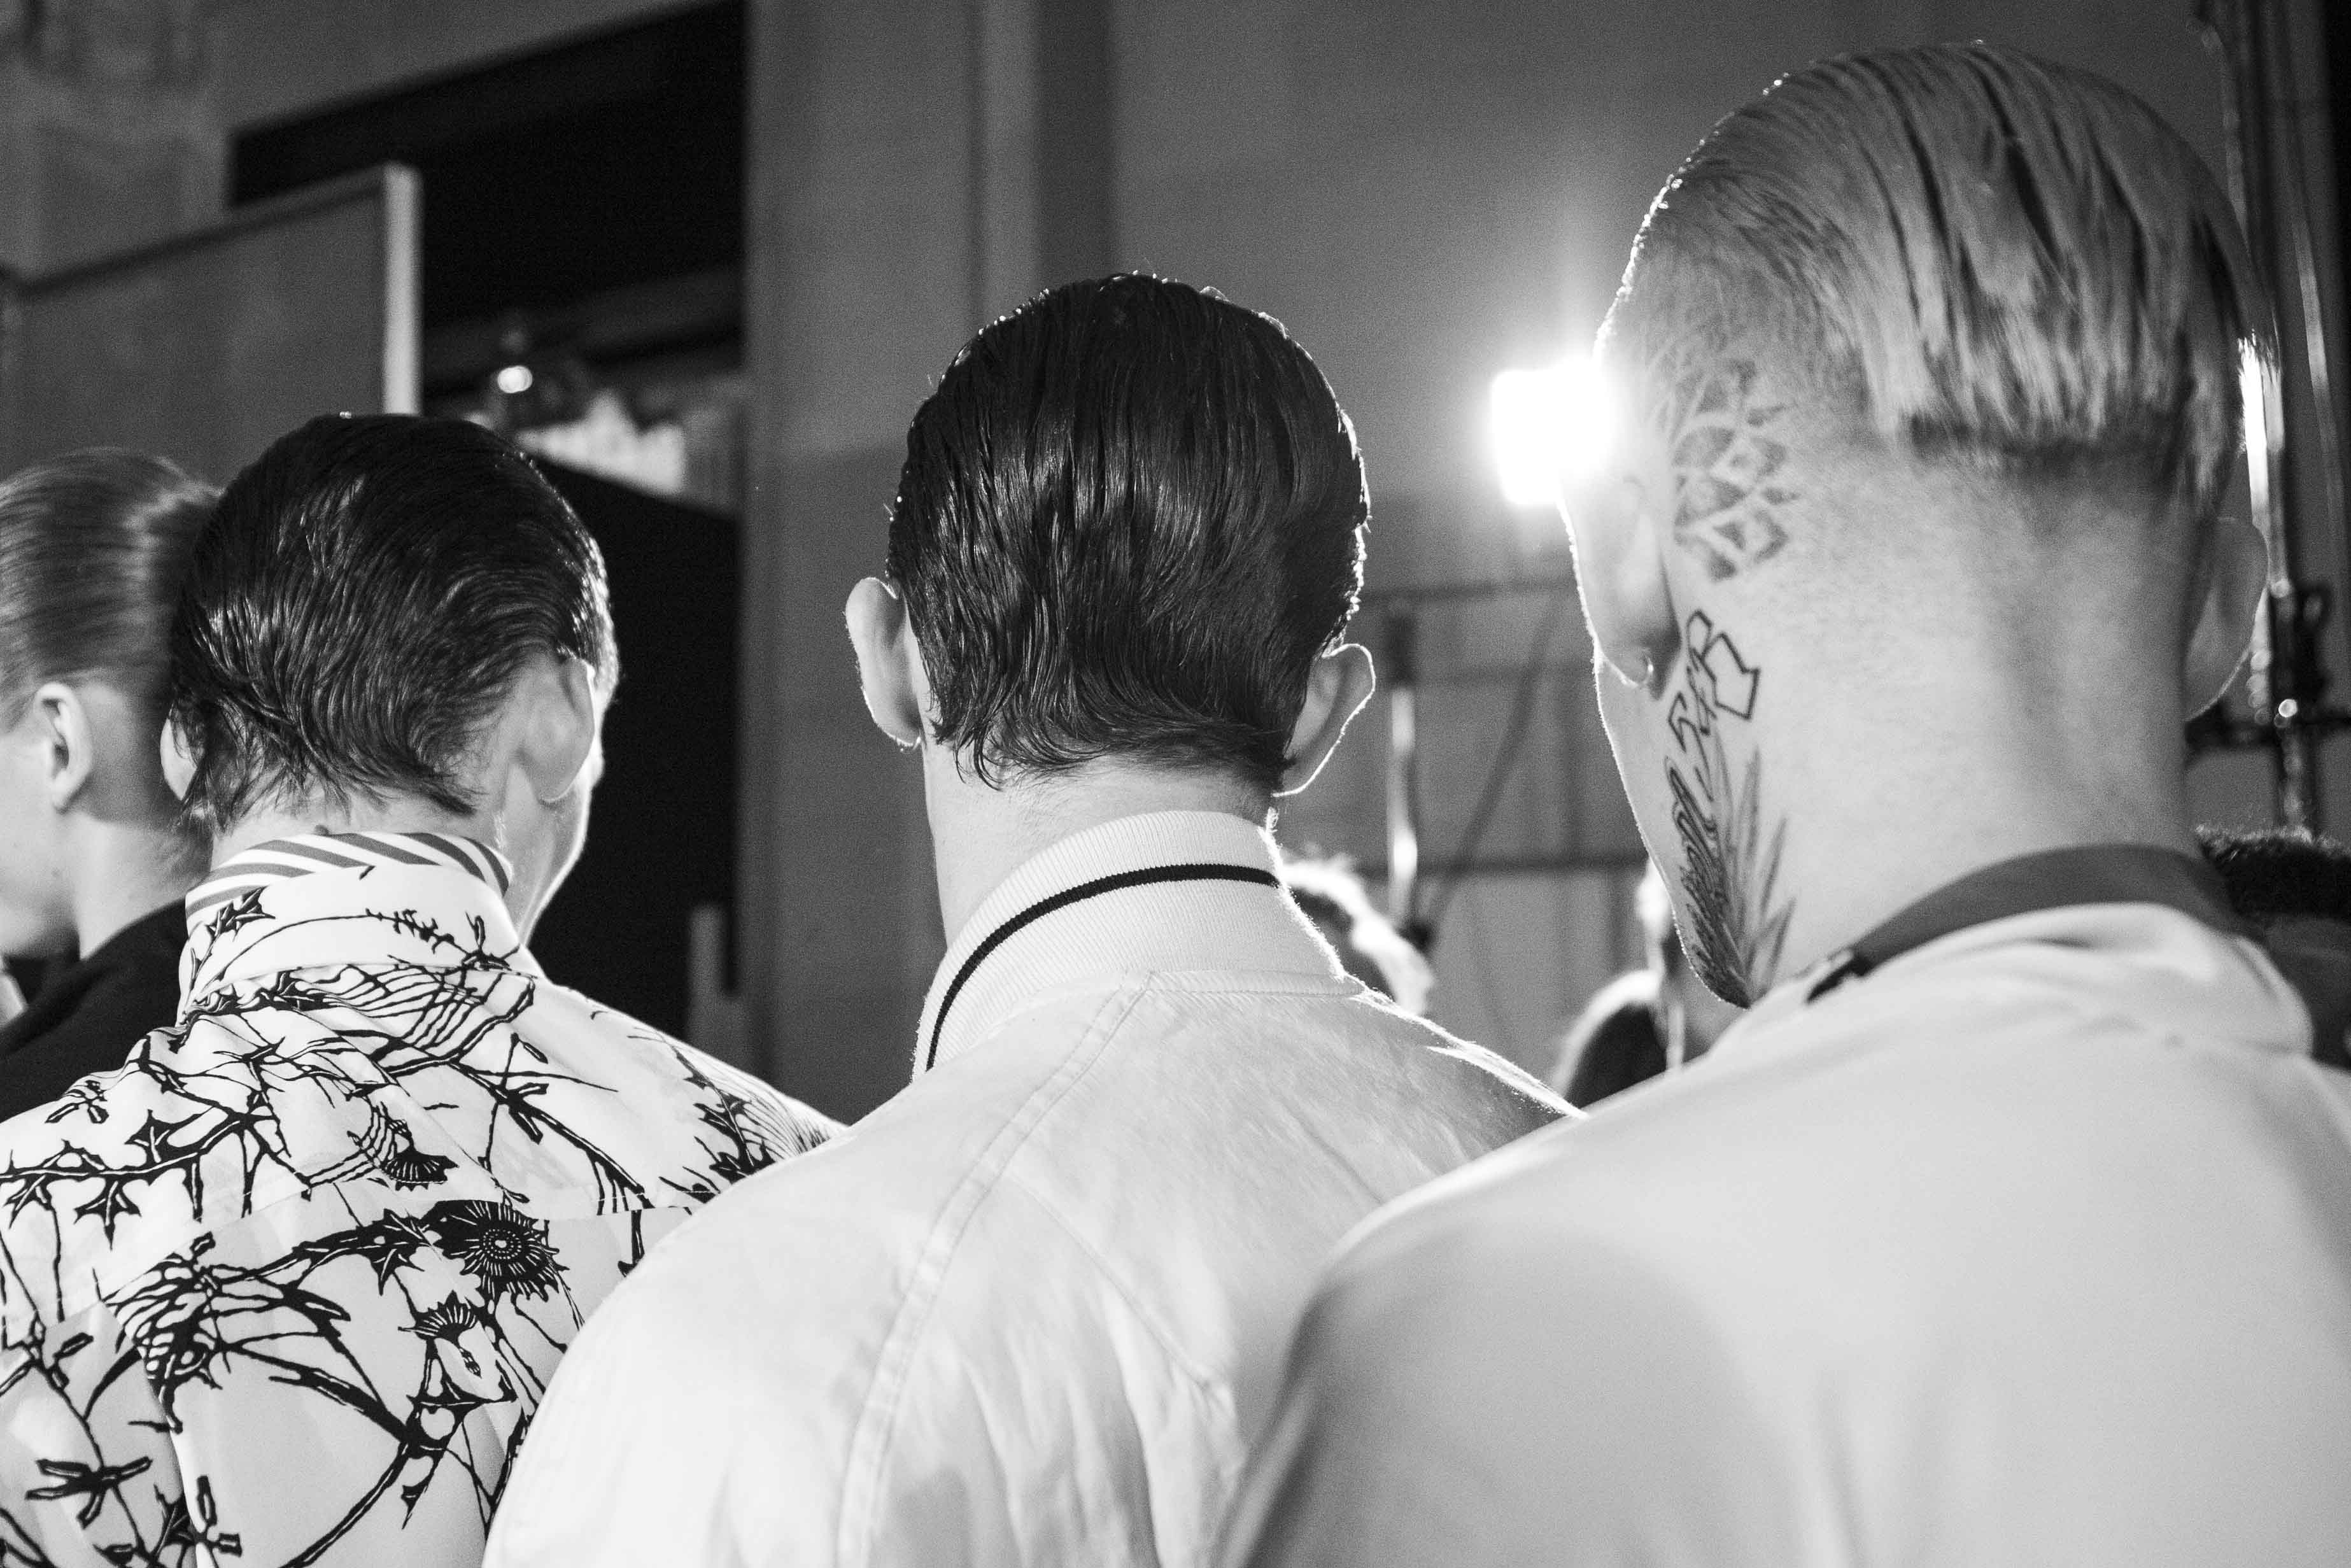 Backstage: Haider Ackermann spring-summer 2017 show for men